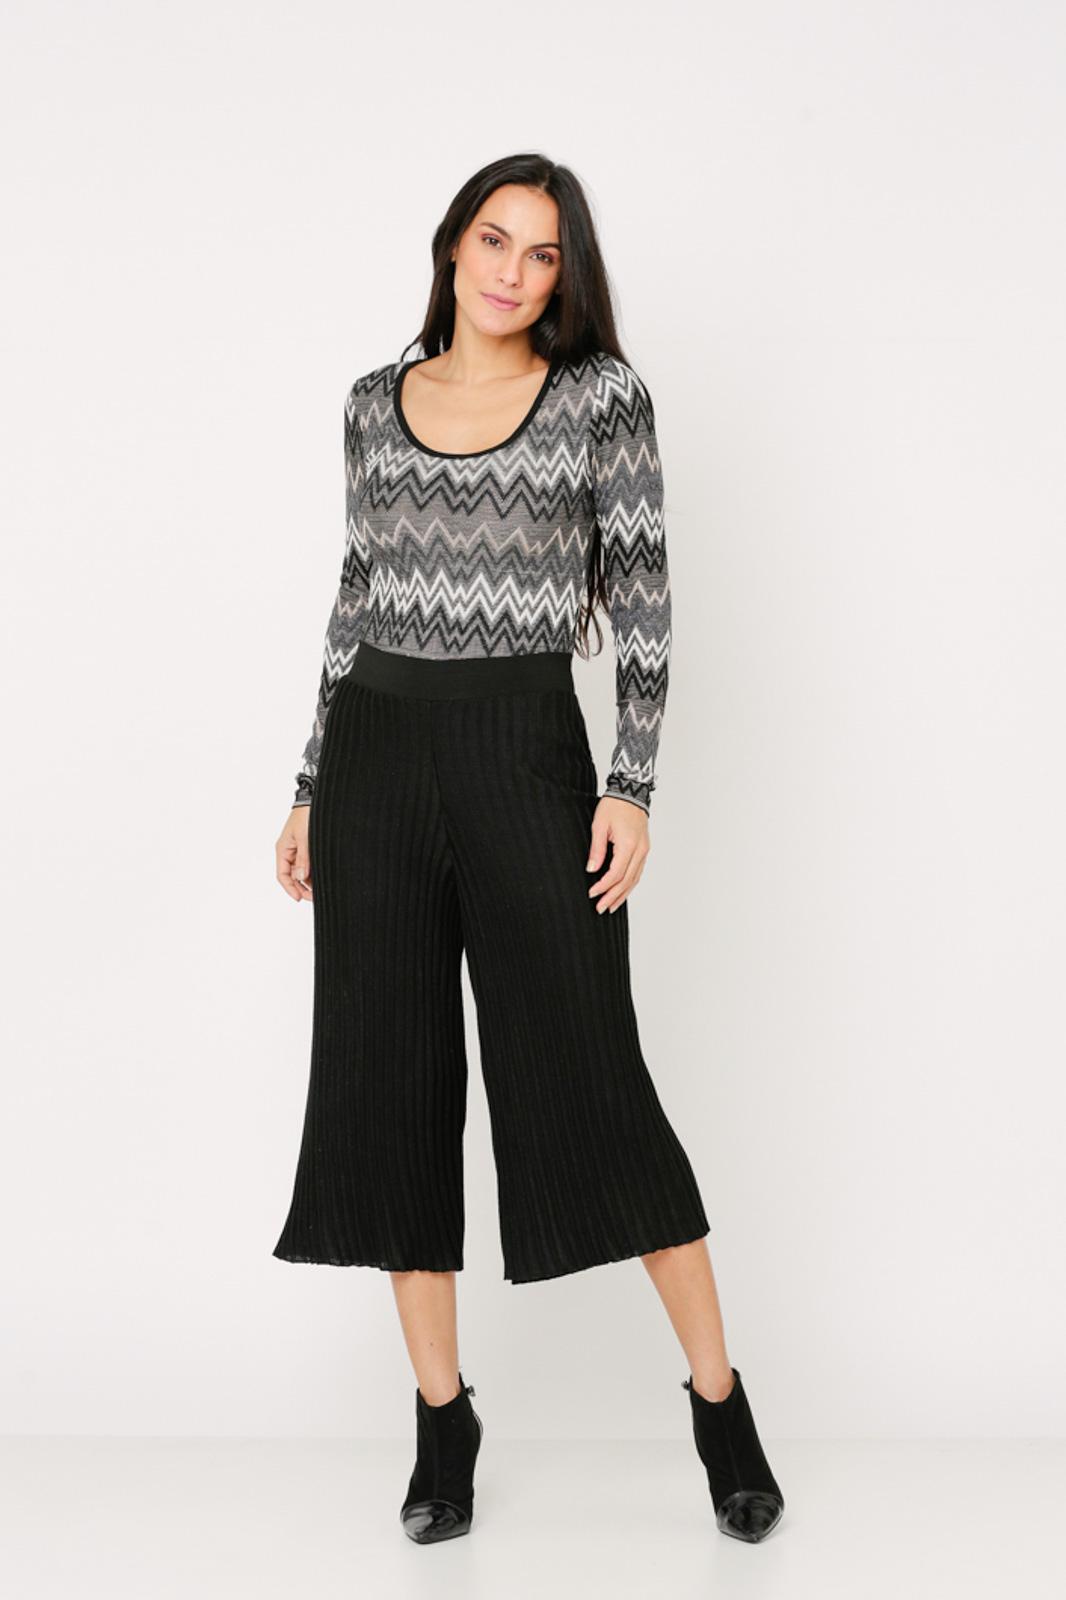 Conjunto de tricot Ralm calça pantacourt nervuras e body zig zag - Preto